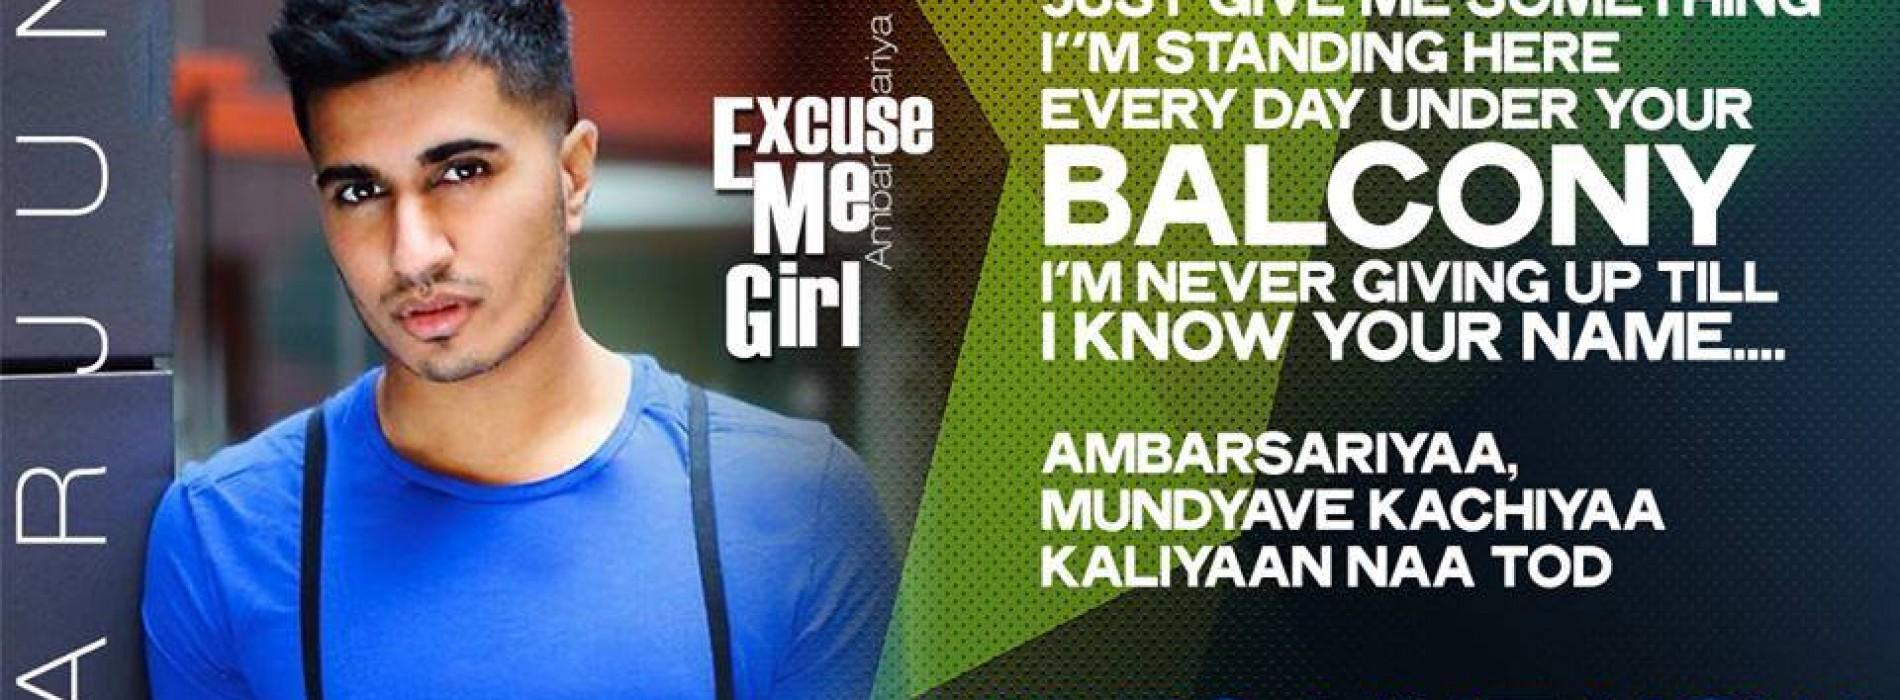 Arjun & Sona Mohapatra – Excuse Me Girl (Ambarsariya)